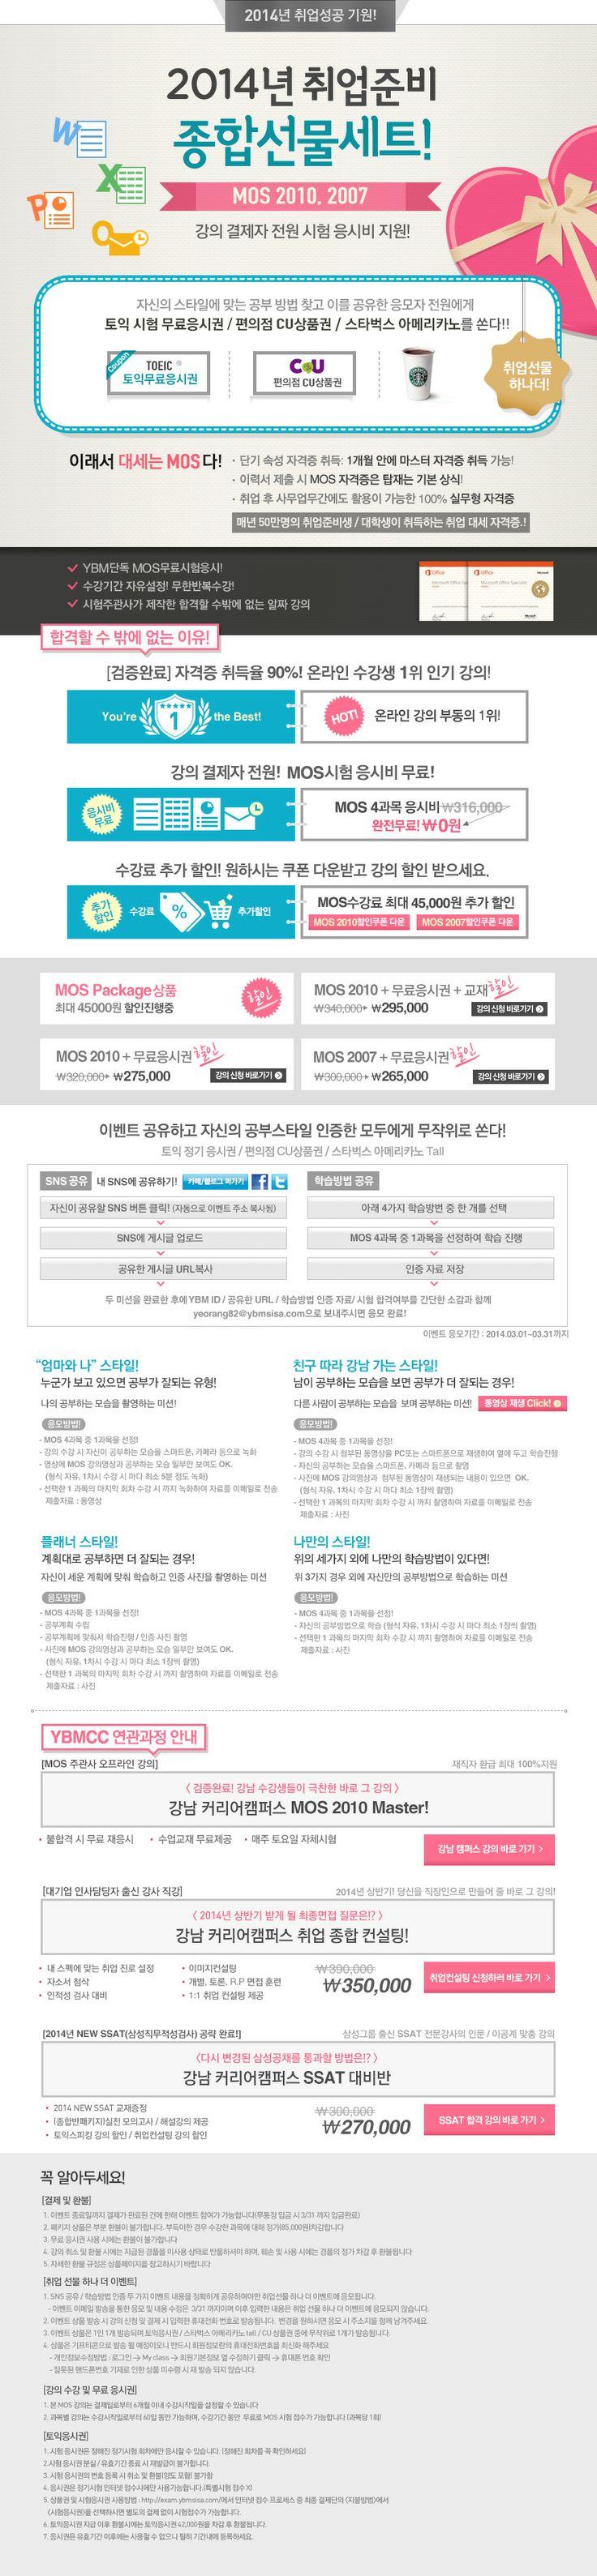 [YBMCC] 3월 MOS 이벤트 (옥)